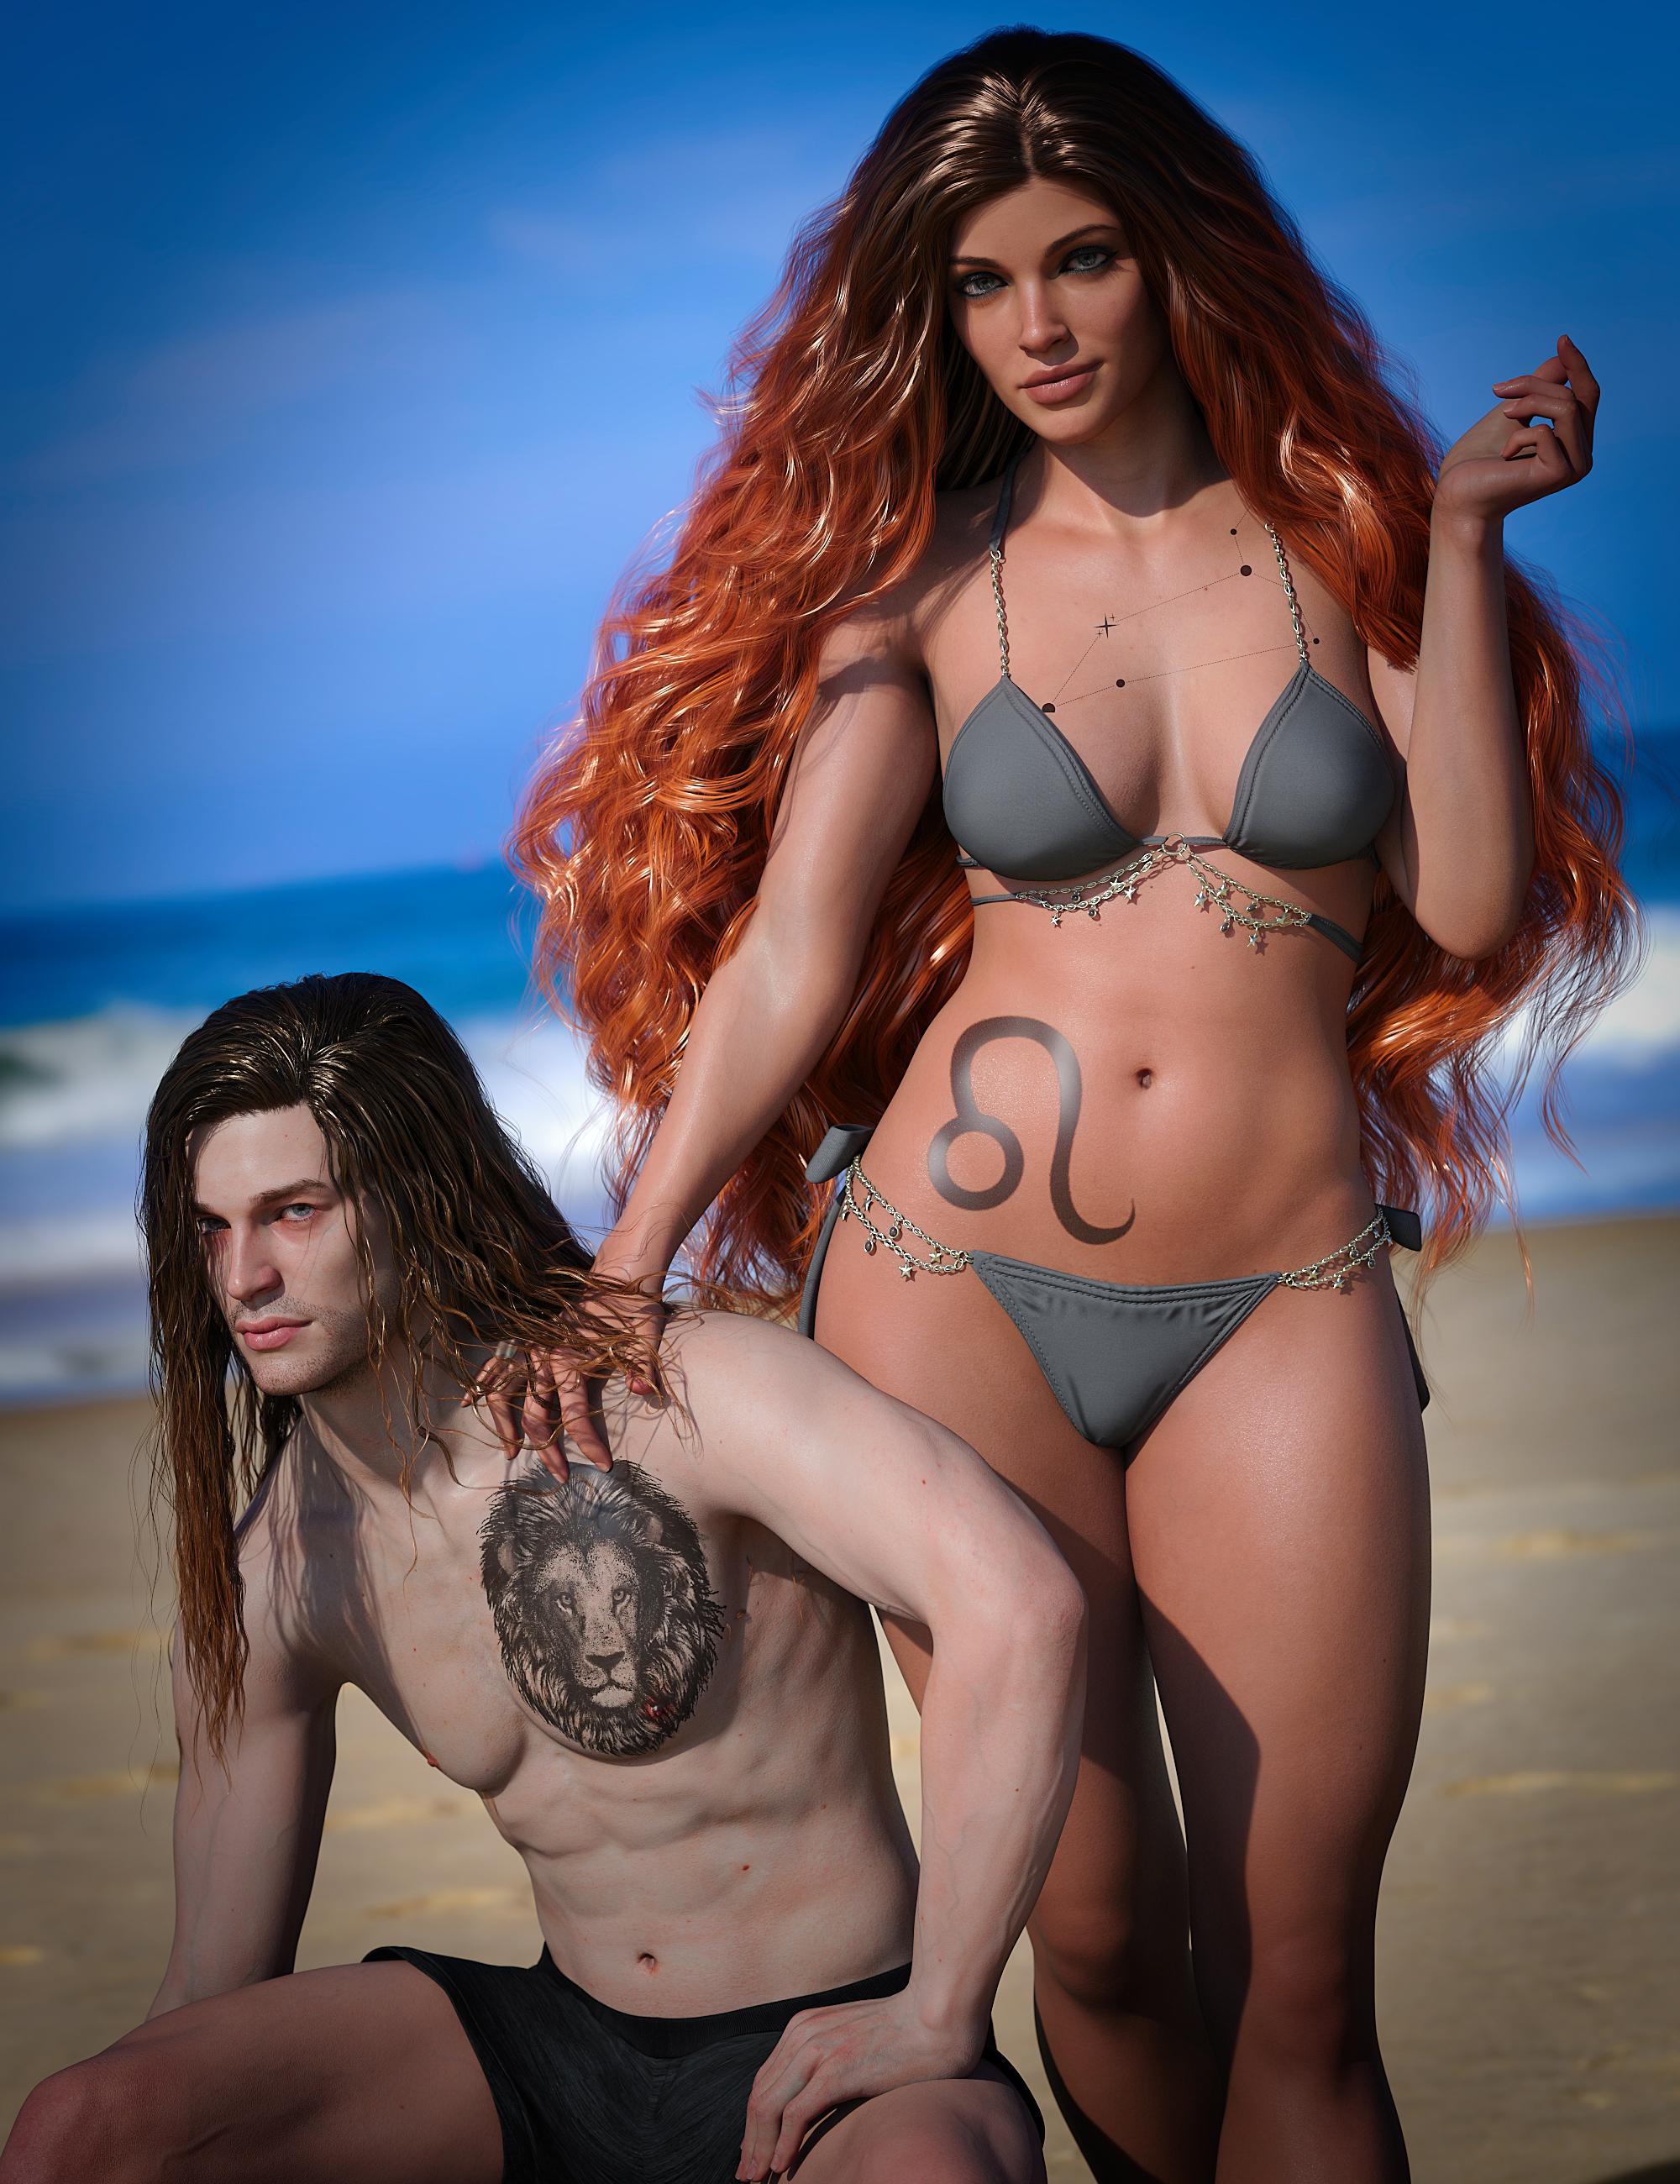 Leo Zodiac Tattoo for Genesis 8.1 by: SR3, 3D Models by Daz 3D